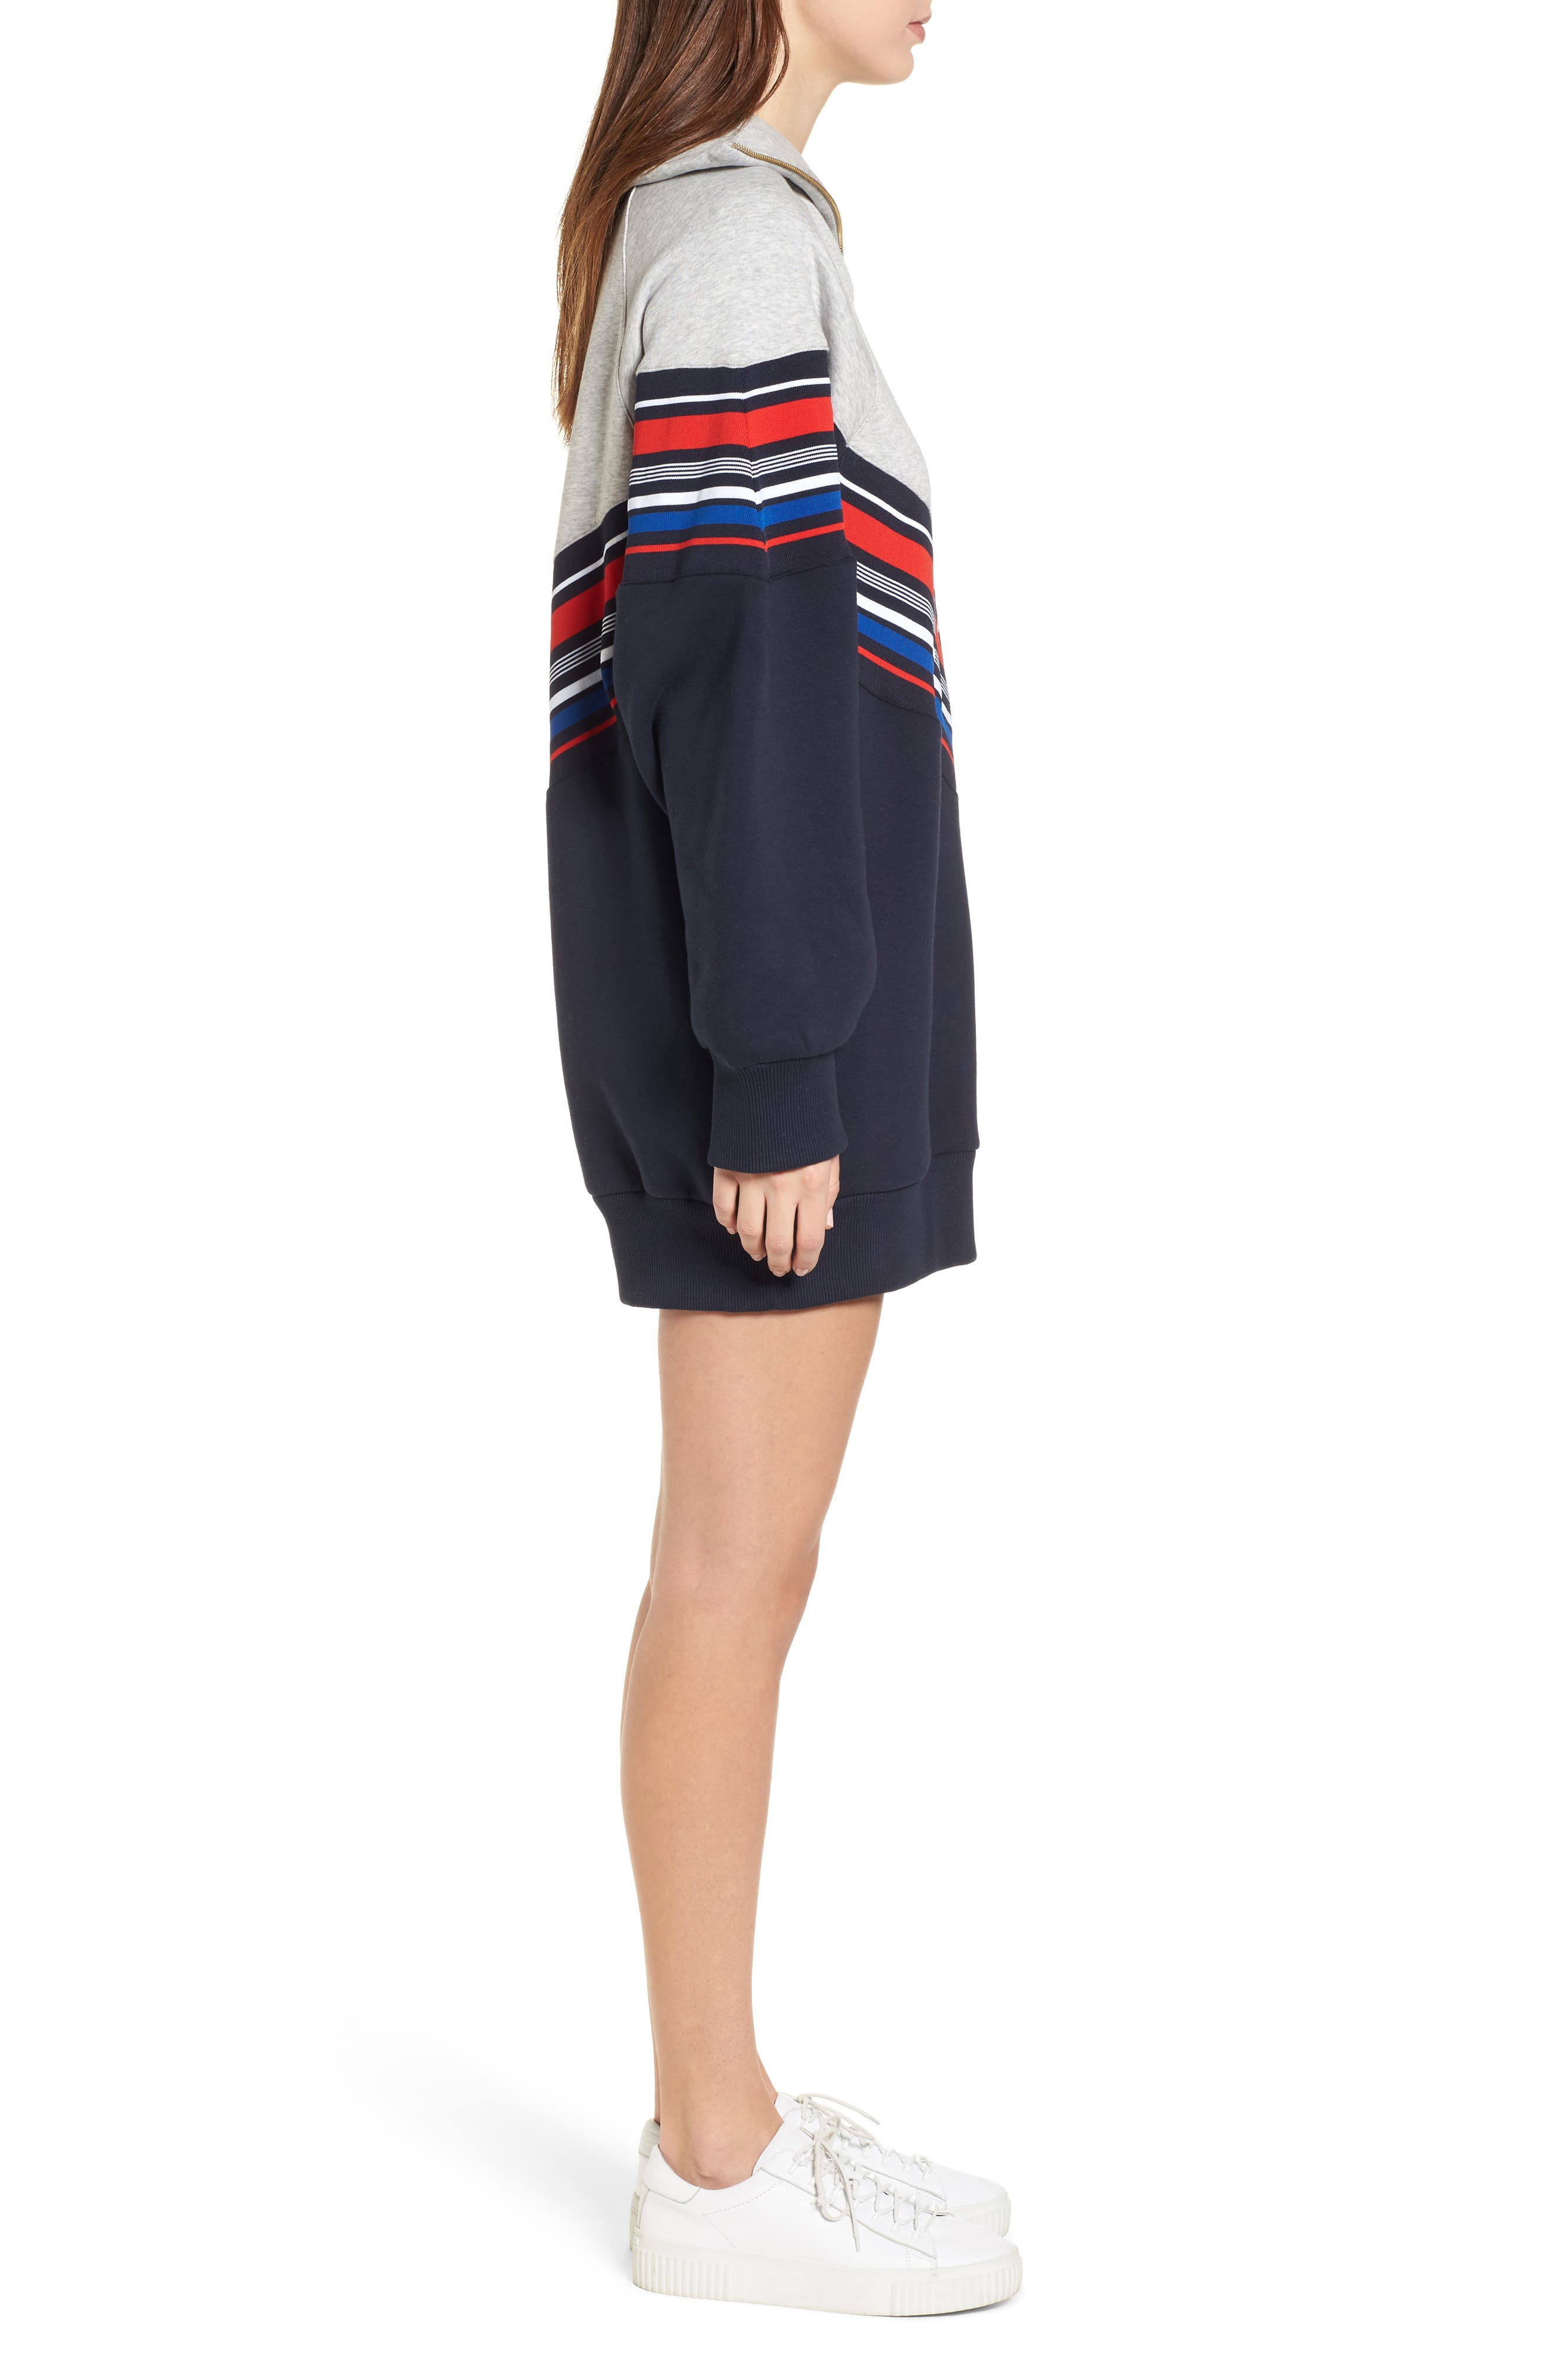 x Gigi Hadid Racing Sweatshirt Dress,                             Alternate thumbnail 3, color,                             Midnight/ Hthr